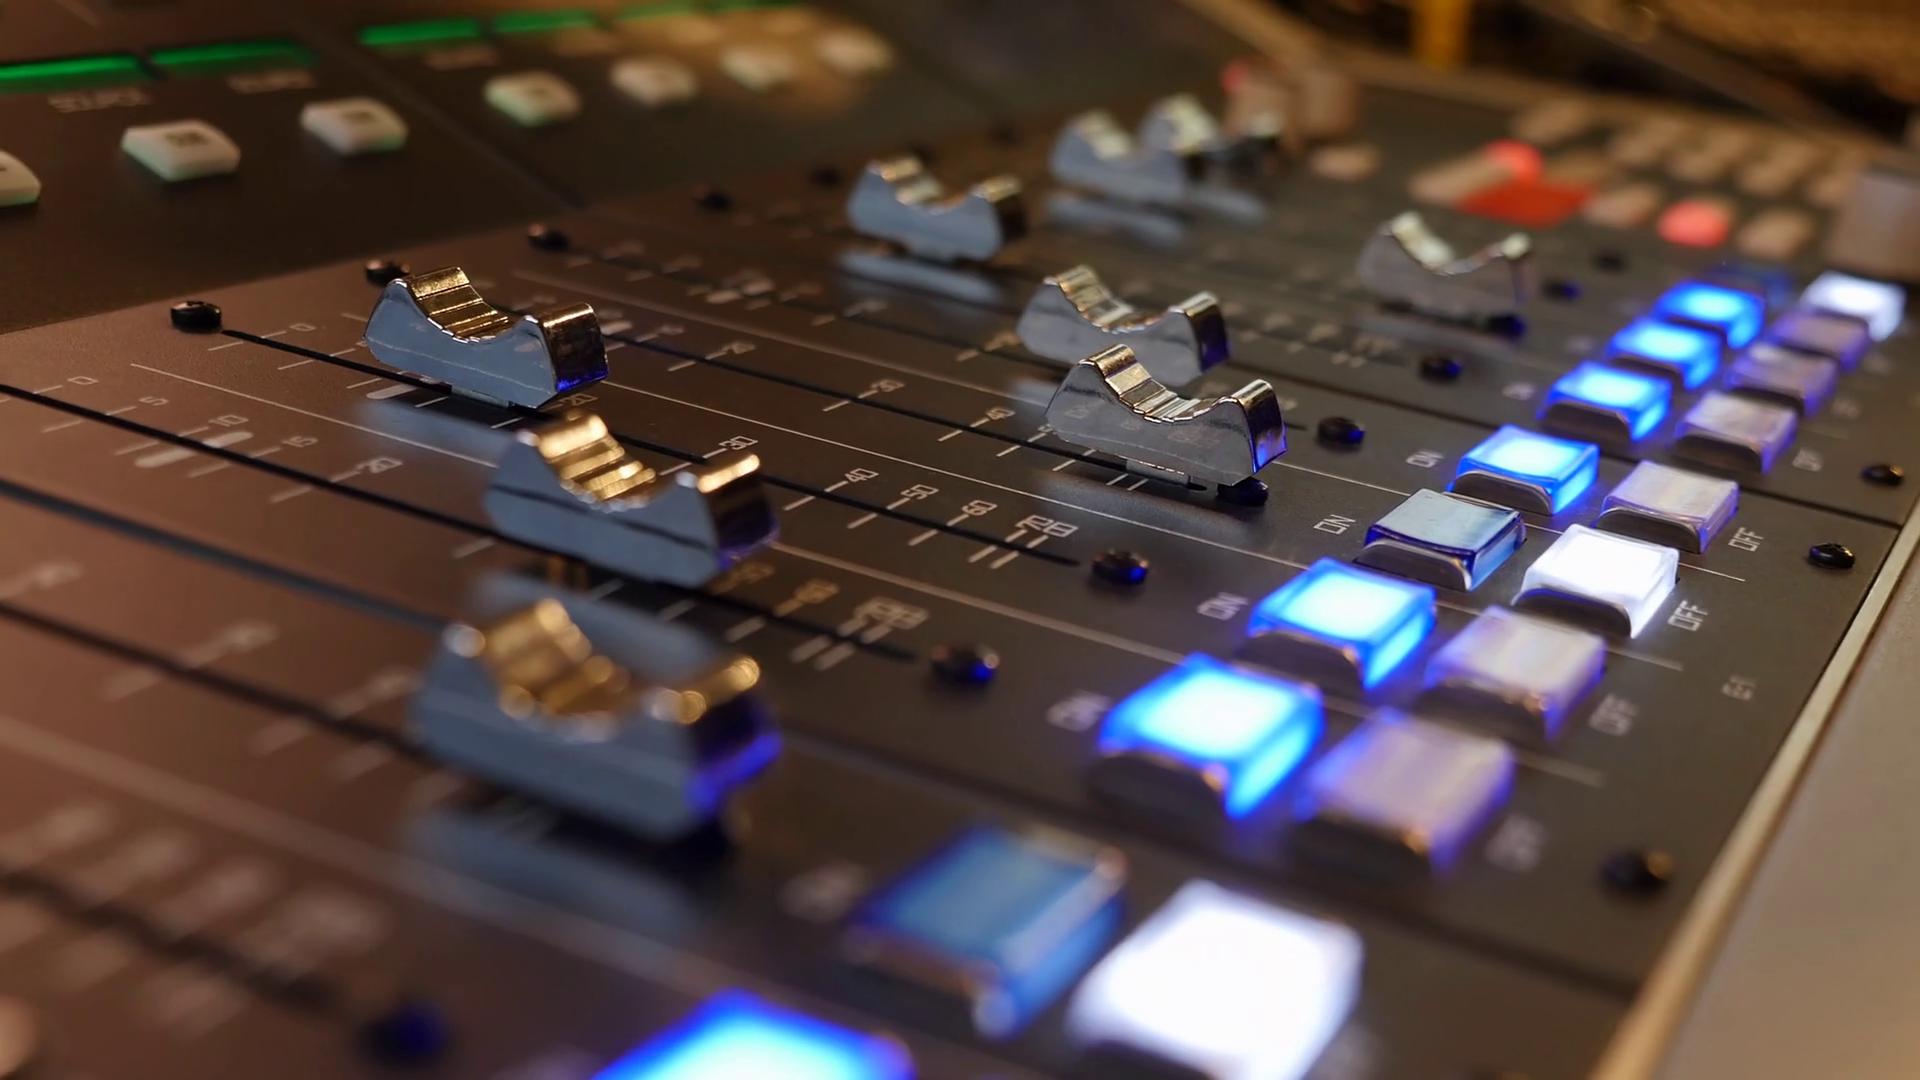 soundboard-audio-mixer-sliding-left_rtgbjsoywe_thumbnail-full01.png